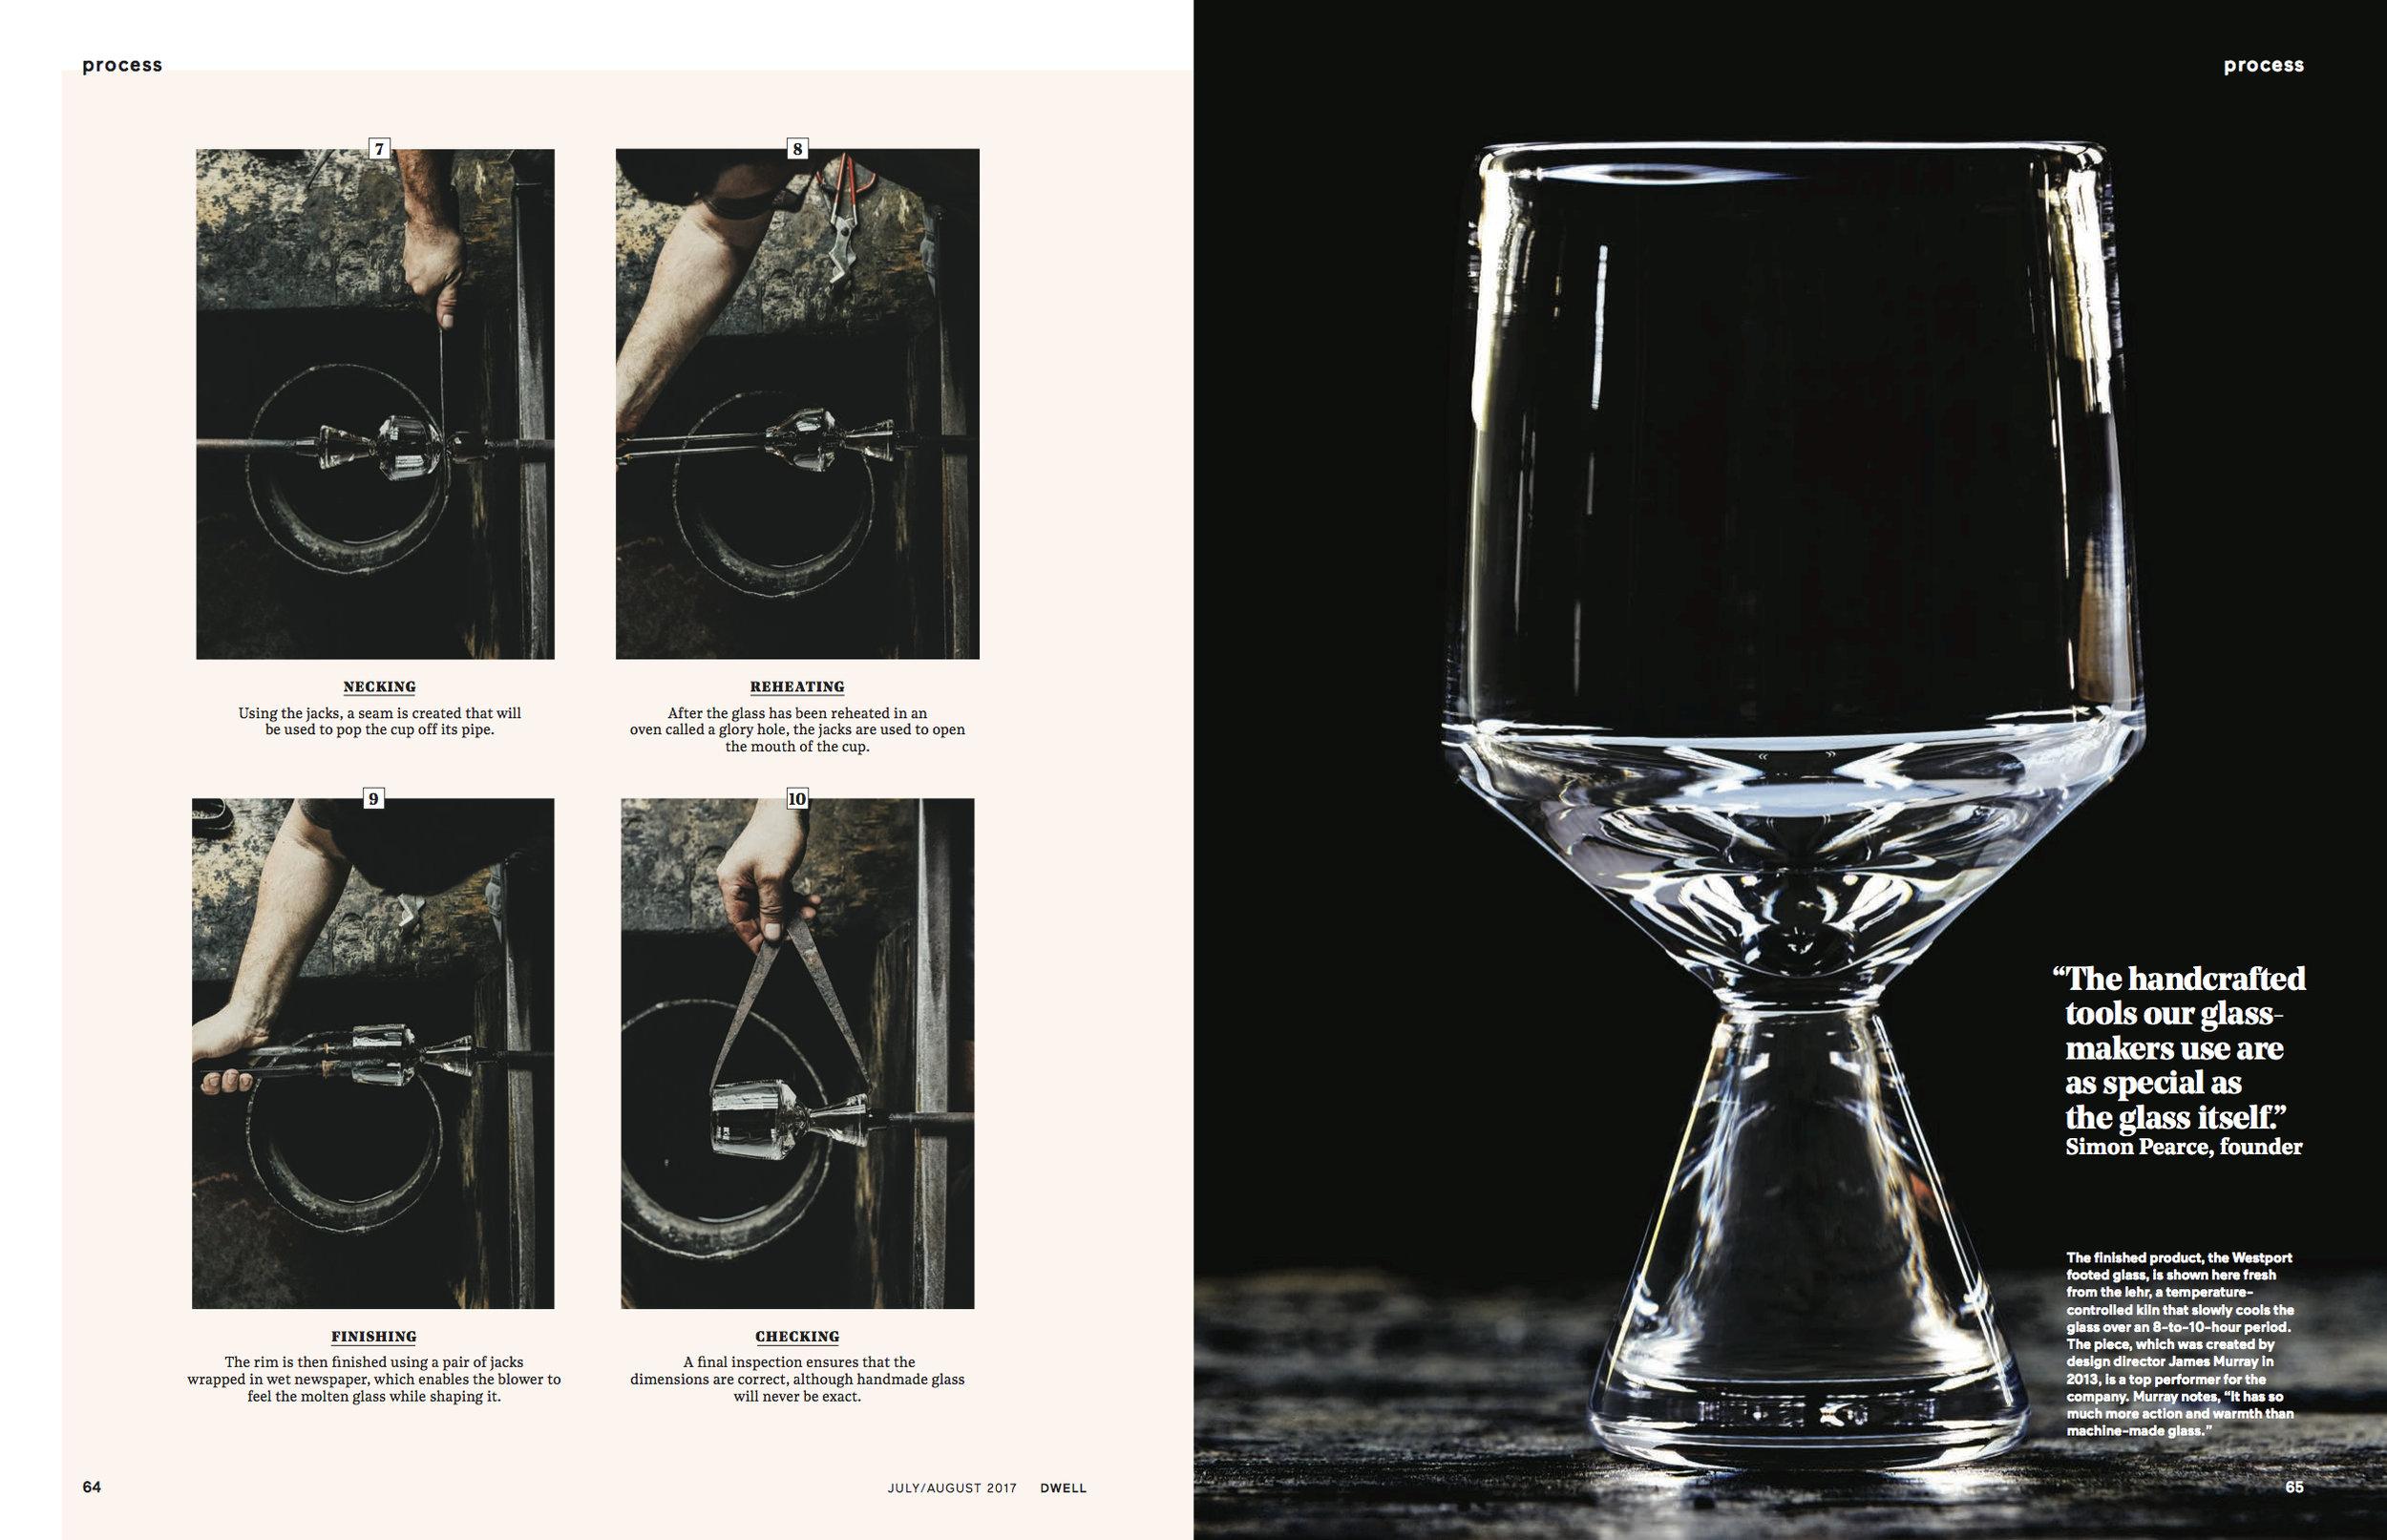 d2d35d3ac80f46 Dwell Feature of the Westport Glass